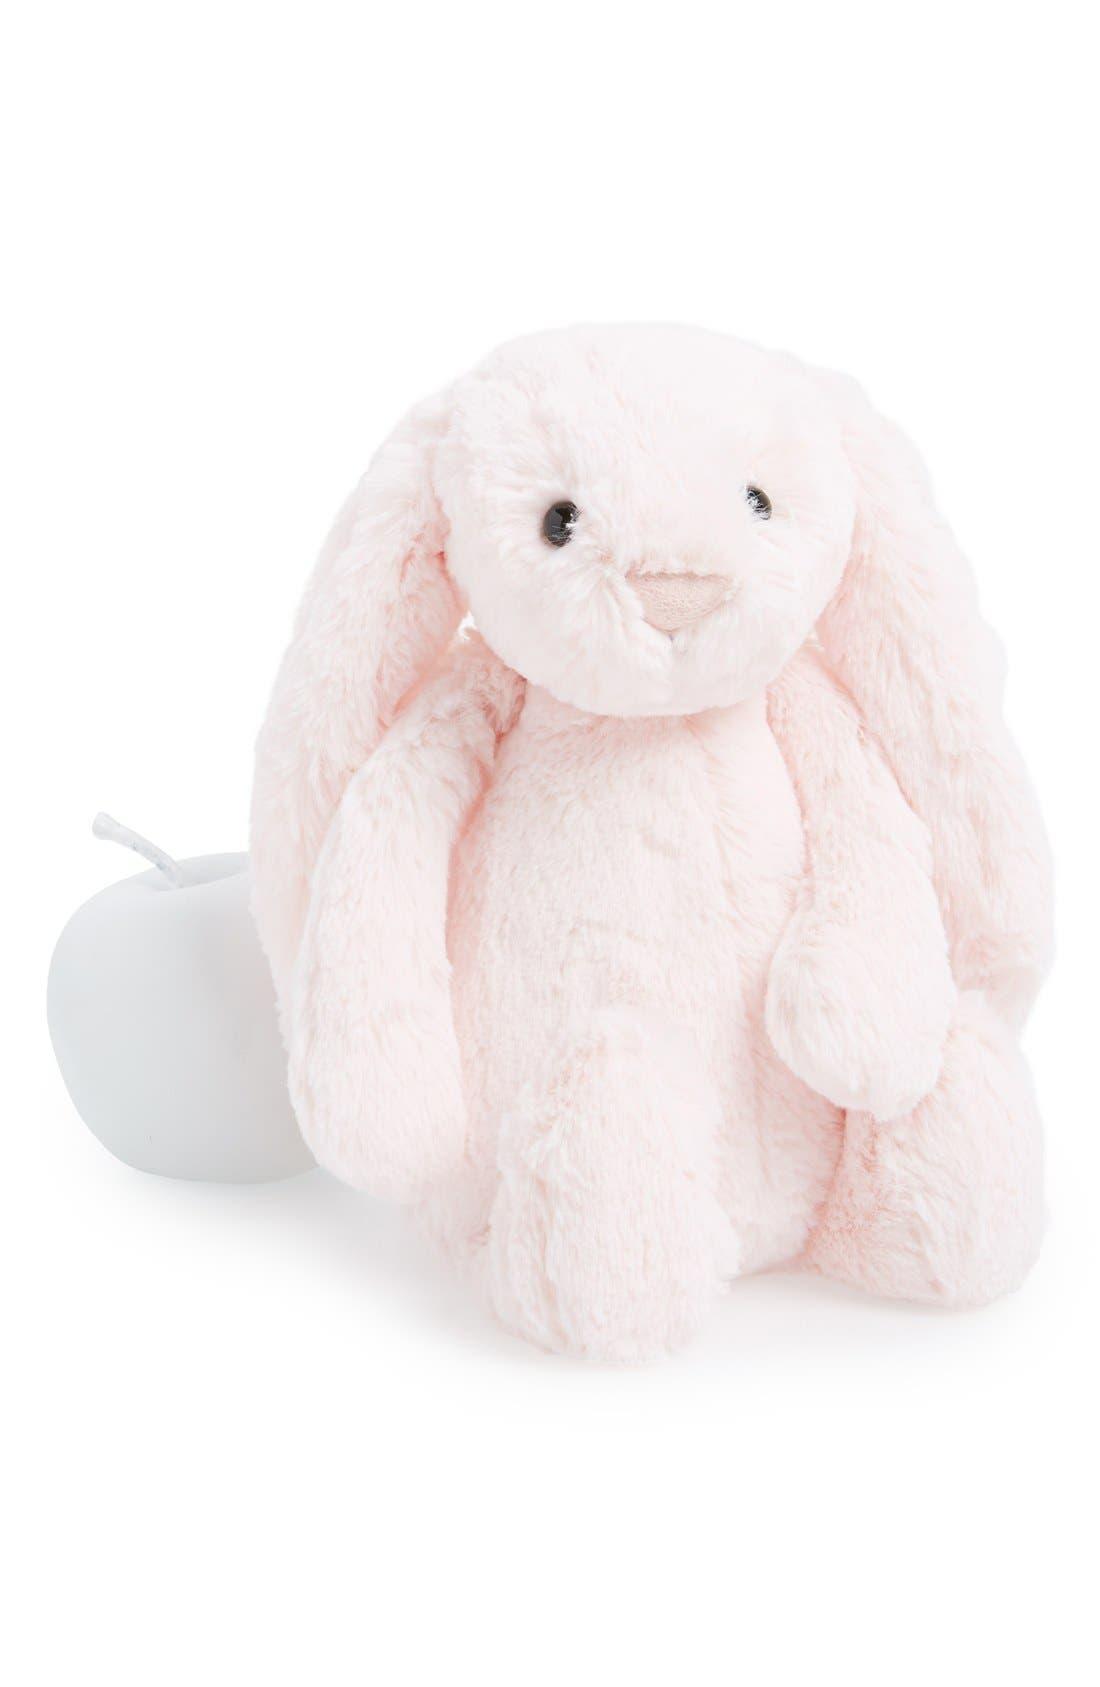 Jellycat 'Begin Bunny' Chime